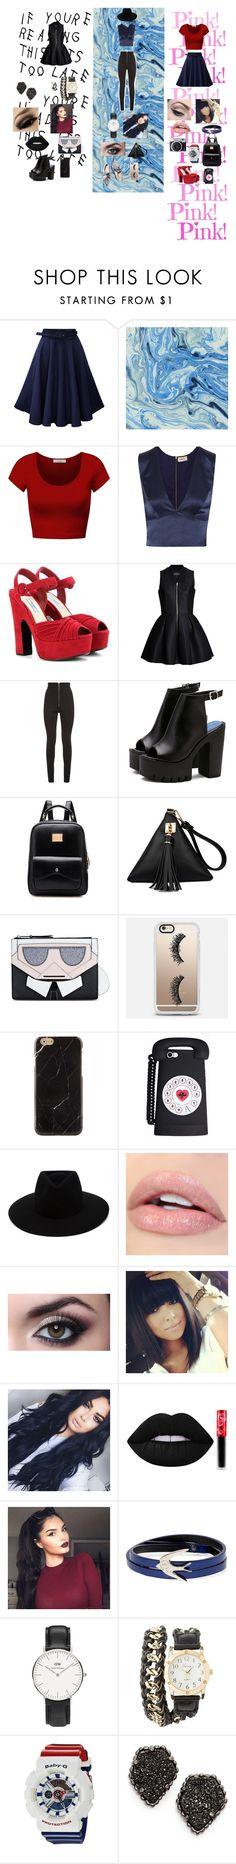 """hola hola"" by melissa-torres-velez on Polyvore featuring moda, DK, L'Agence, Prada, Lavinia Cadar, Balmain, Loeffler Randall, Karl Lagerfeld, Casetify y rag & bone"